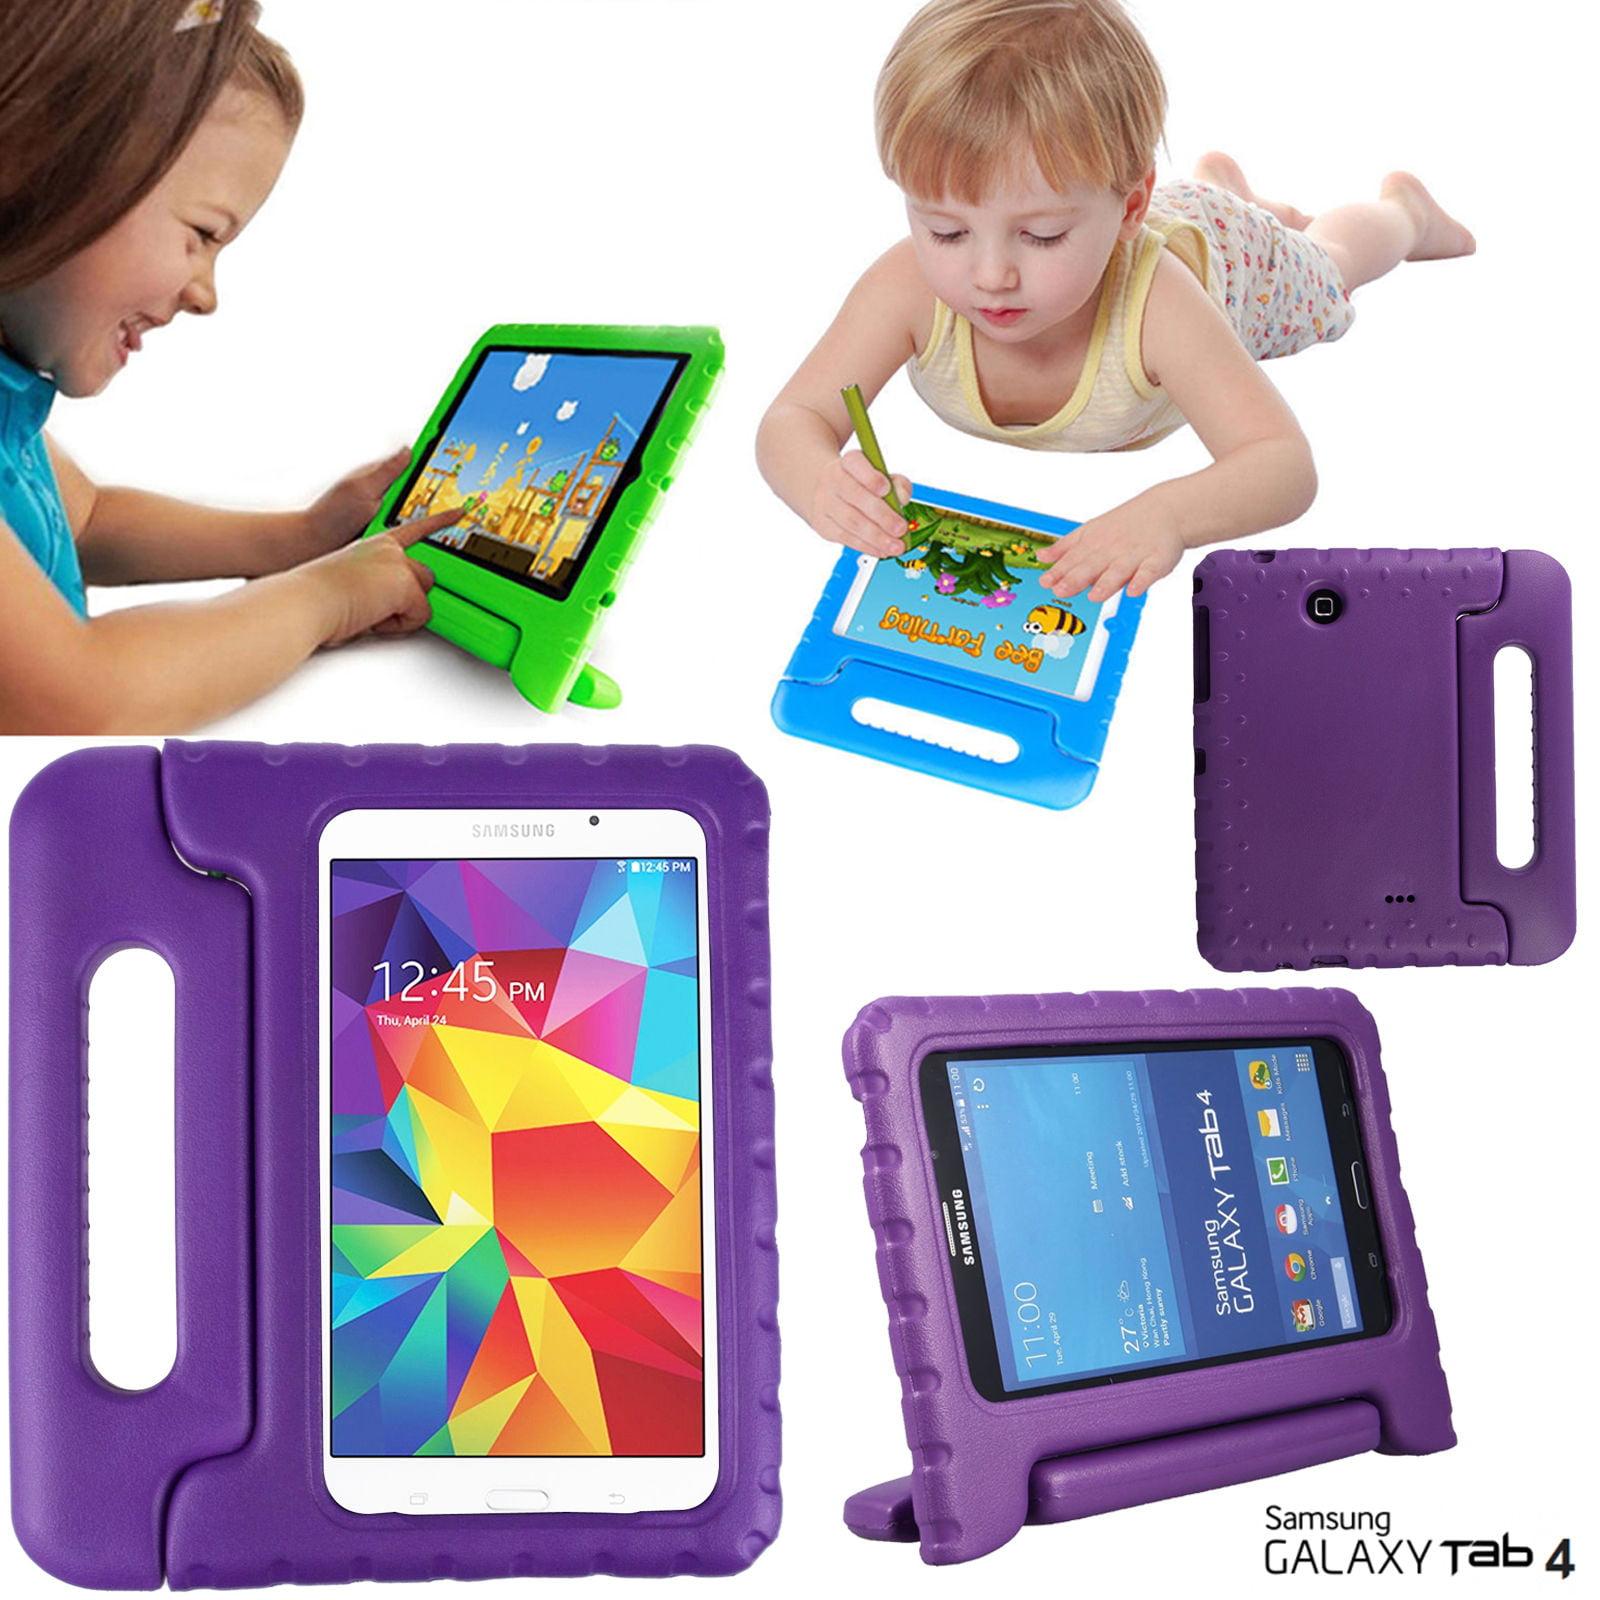 Galaxy Tab 4 7.0 T230 Kids Case by KIQ Child-Friendly Fun Kiddie Tablet Cover EVA Foam For Samsung Galaxy Tab 4 7.0 Inch SM-T230 (Black)